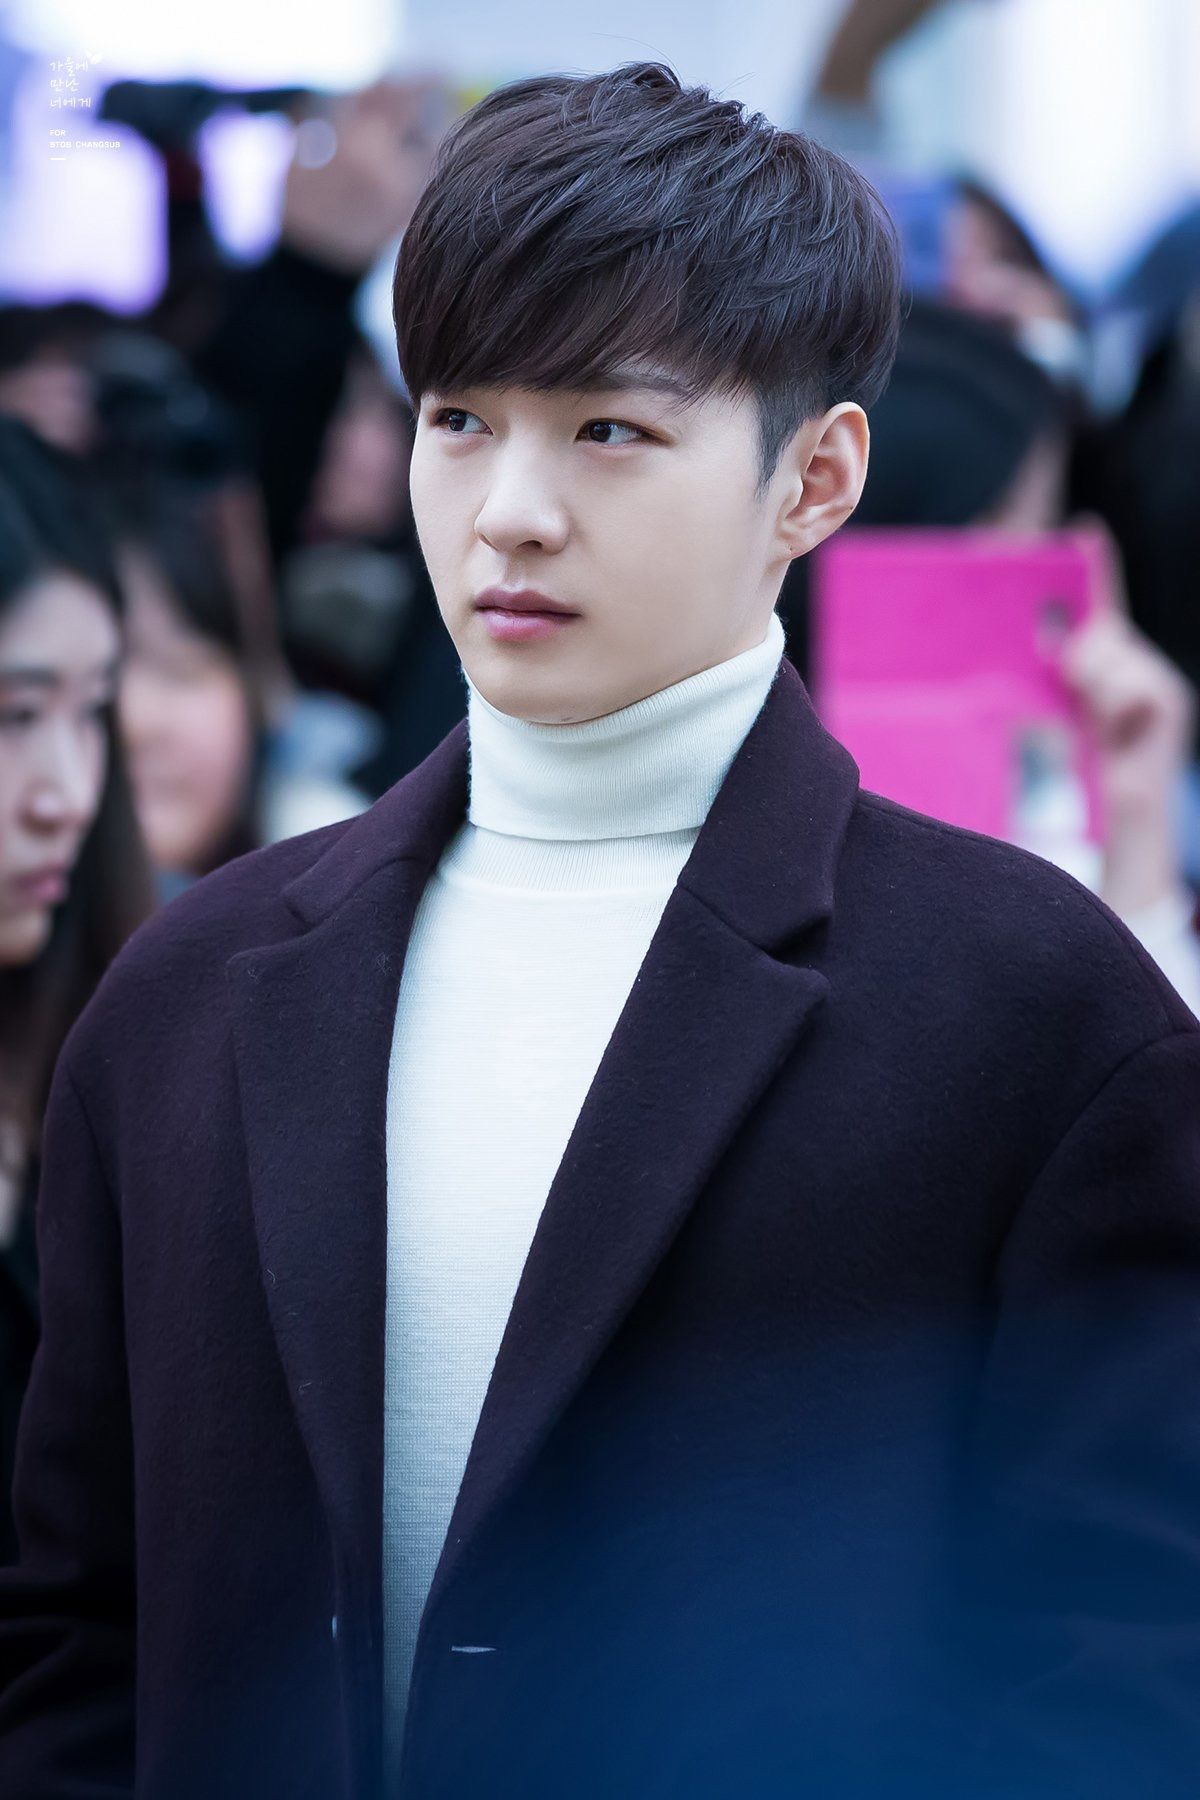 Changsub Personal style Pinterest